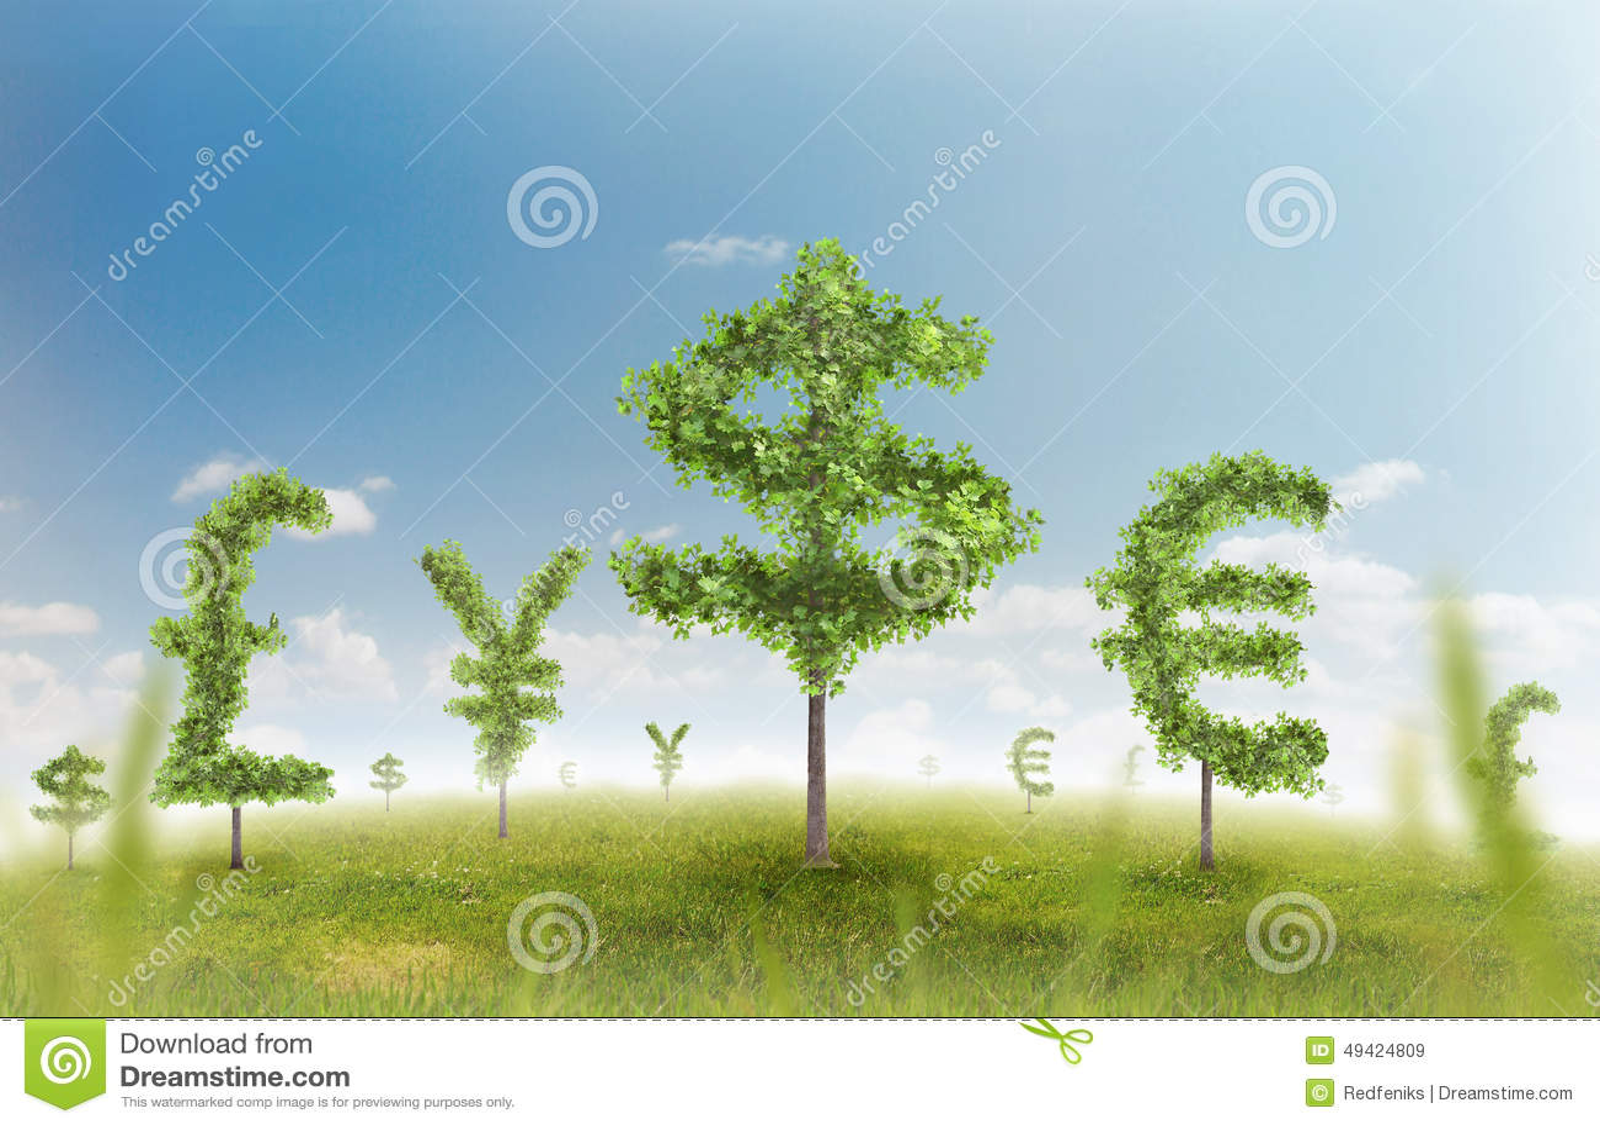 Money trees stock illustration image 49424809 for Natural grasses for landscaping